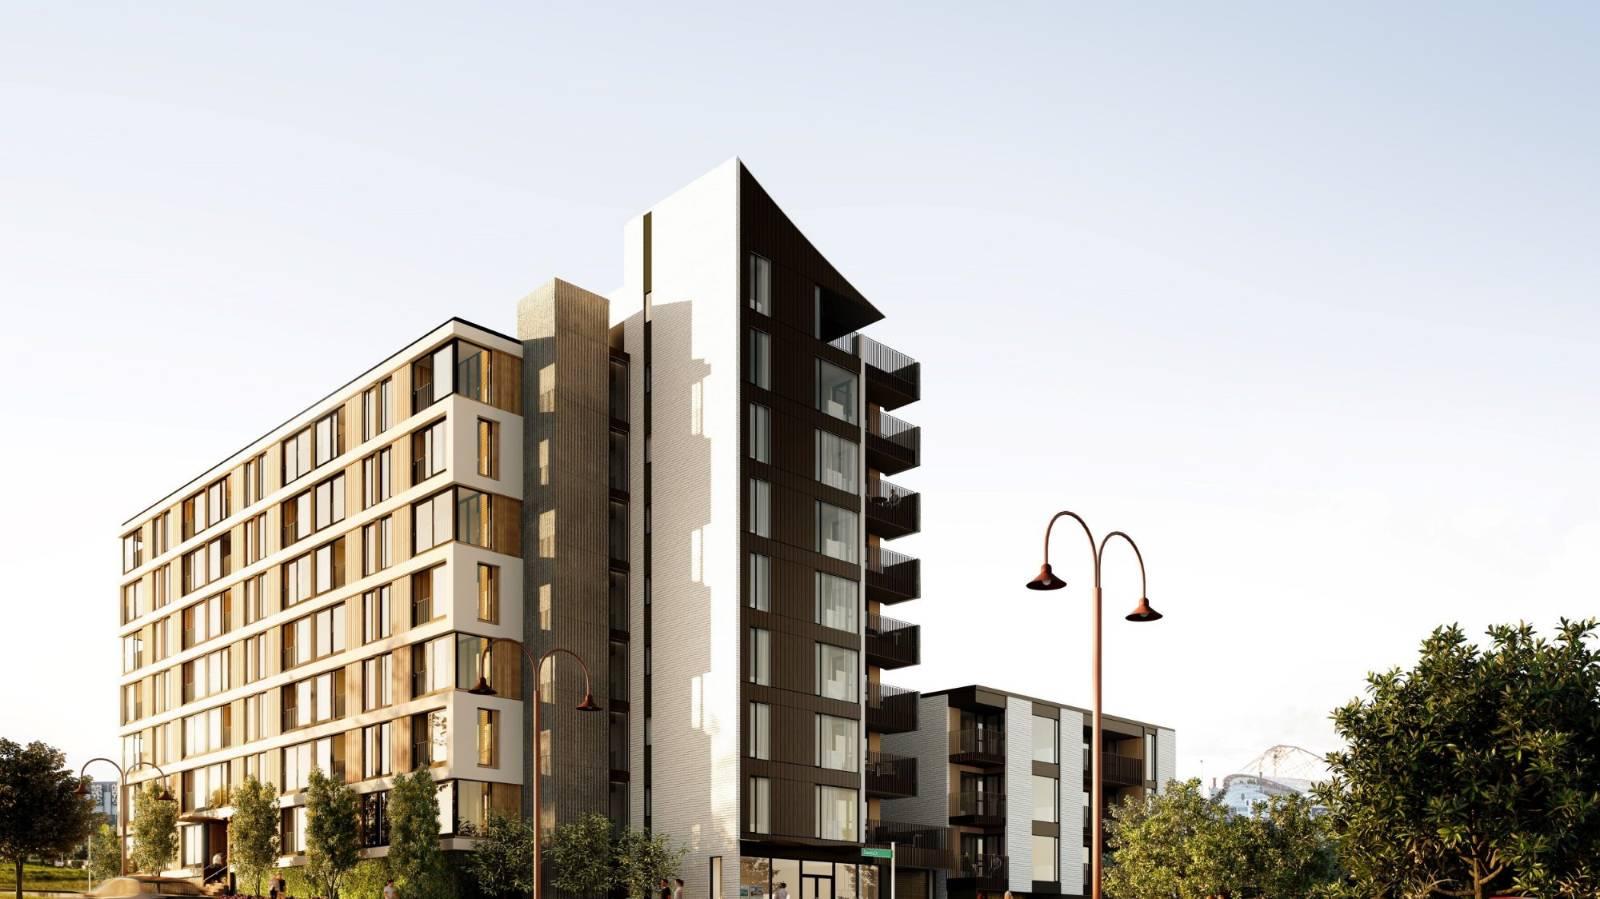 KiwiBuild sales help hold up Auckland apartment market